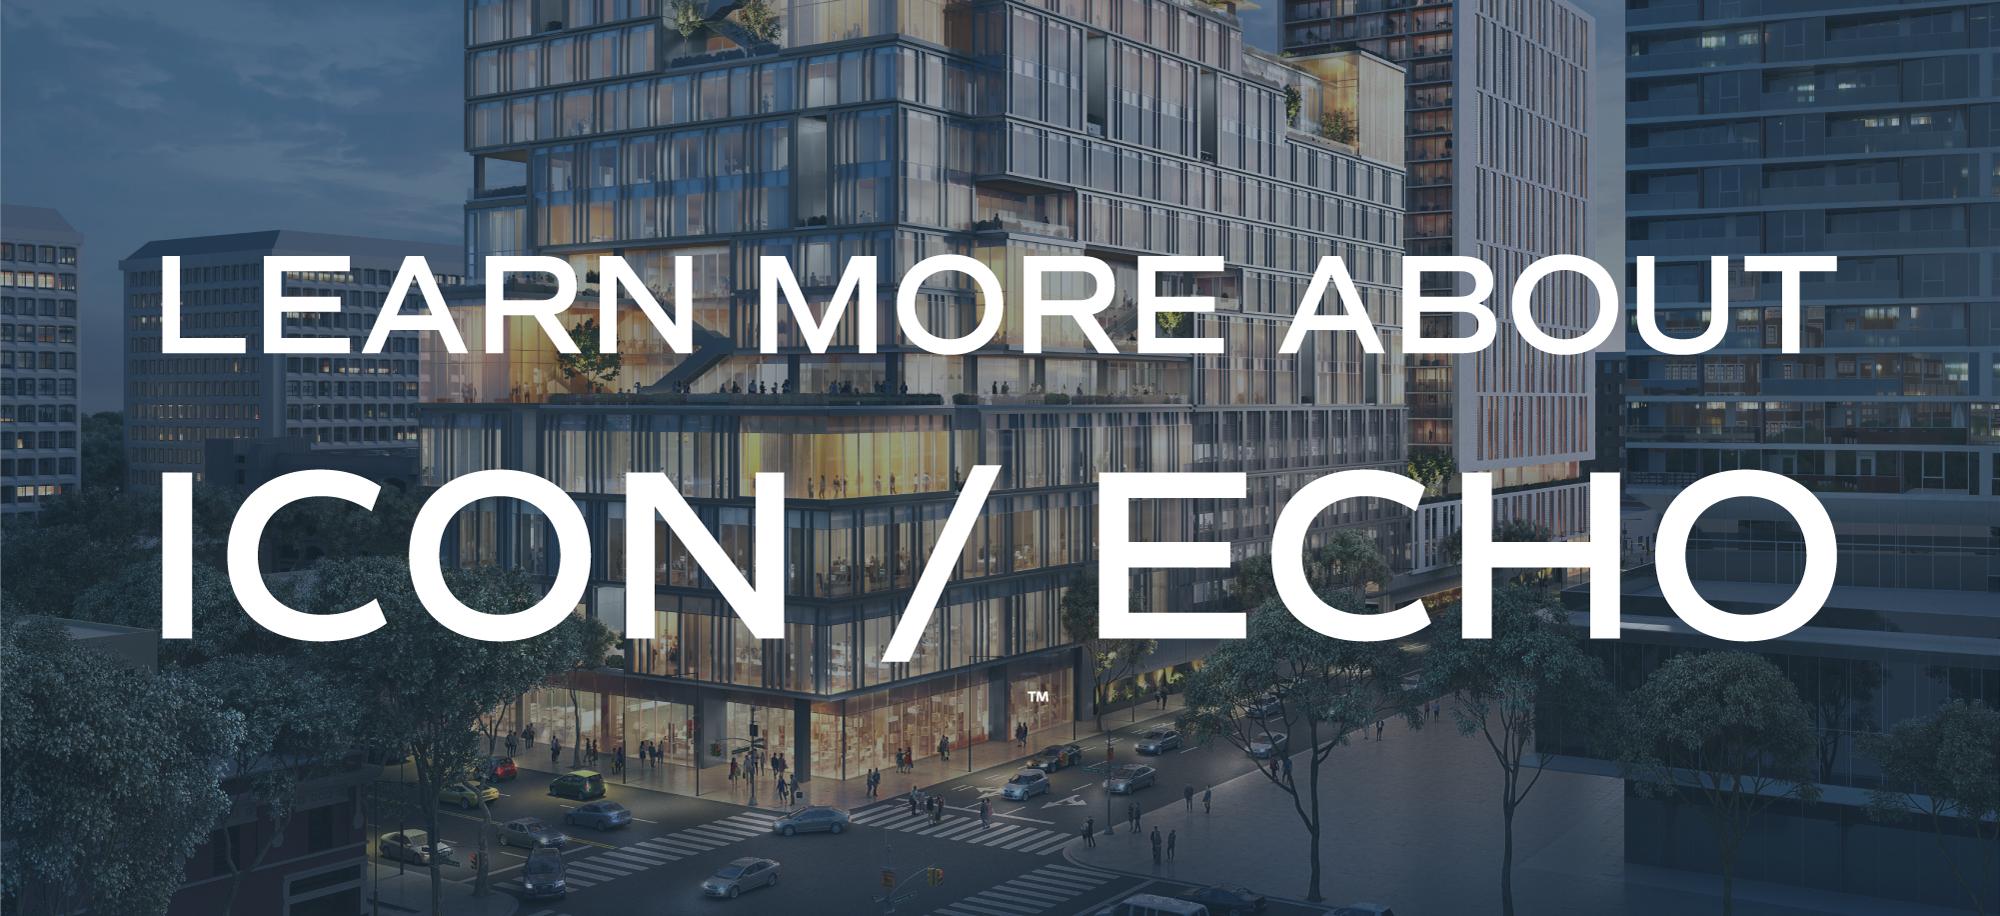 Project Spotlight: Icon/Echo